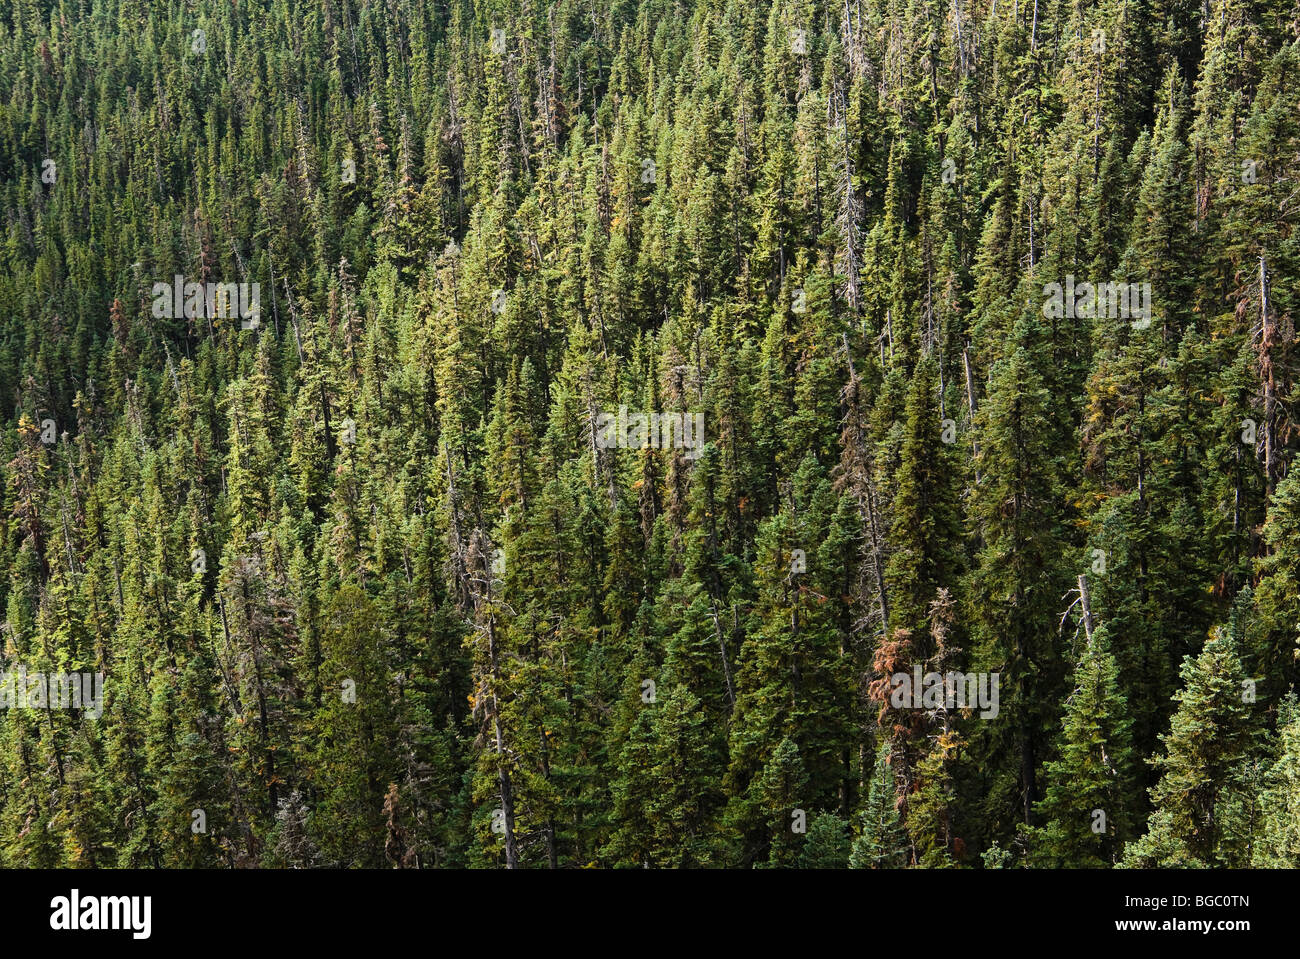 Coniferous sub alpine forest near Washington Pass in the North Cascades of Washington, USA. - Stock Image